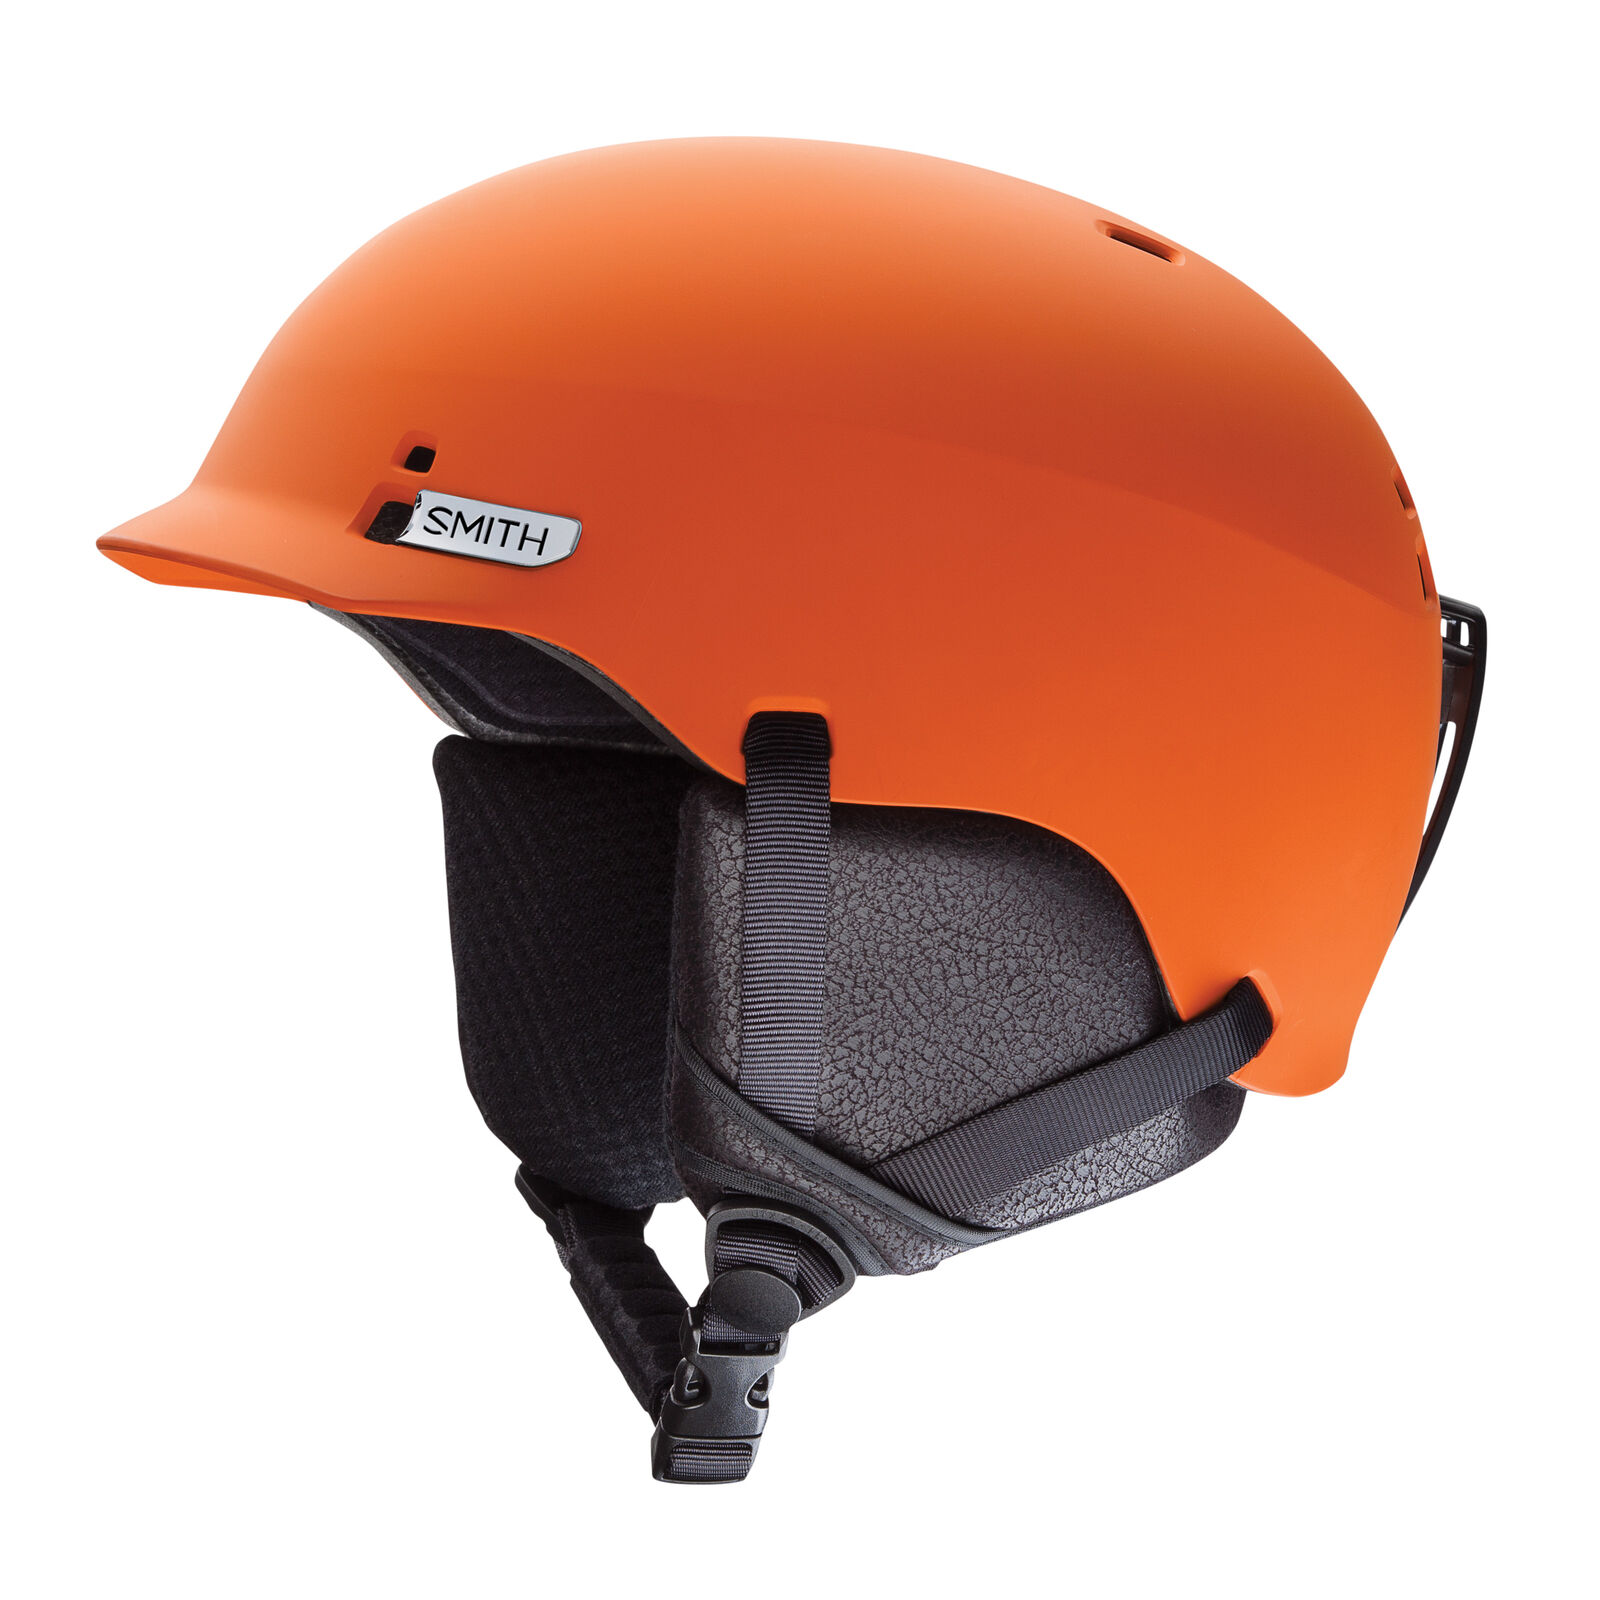 Smith Casco de Snowboard Esquí Gage orange  colors Lisos Ajustable  good quality